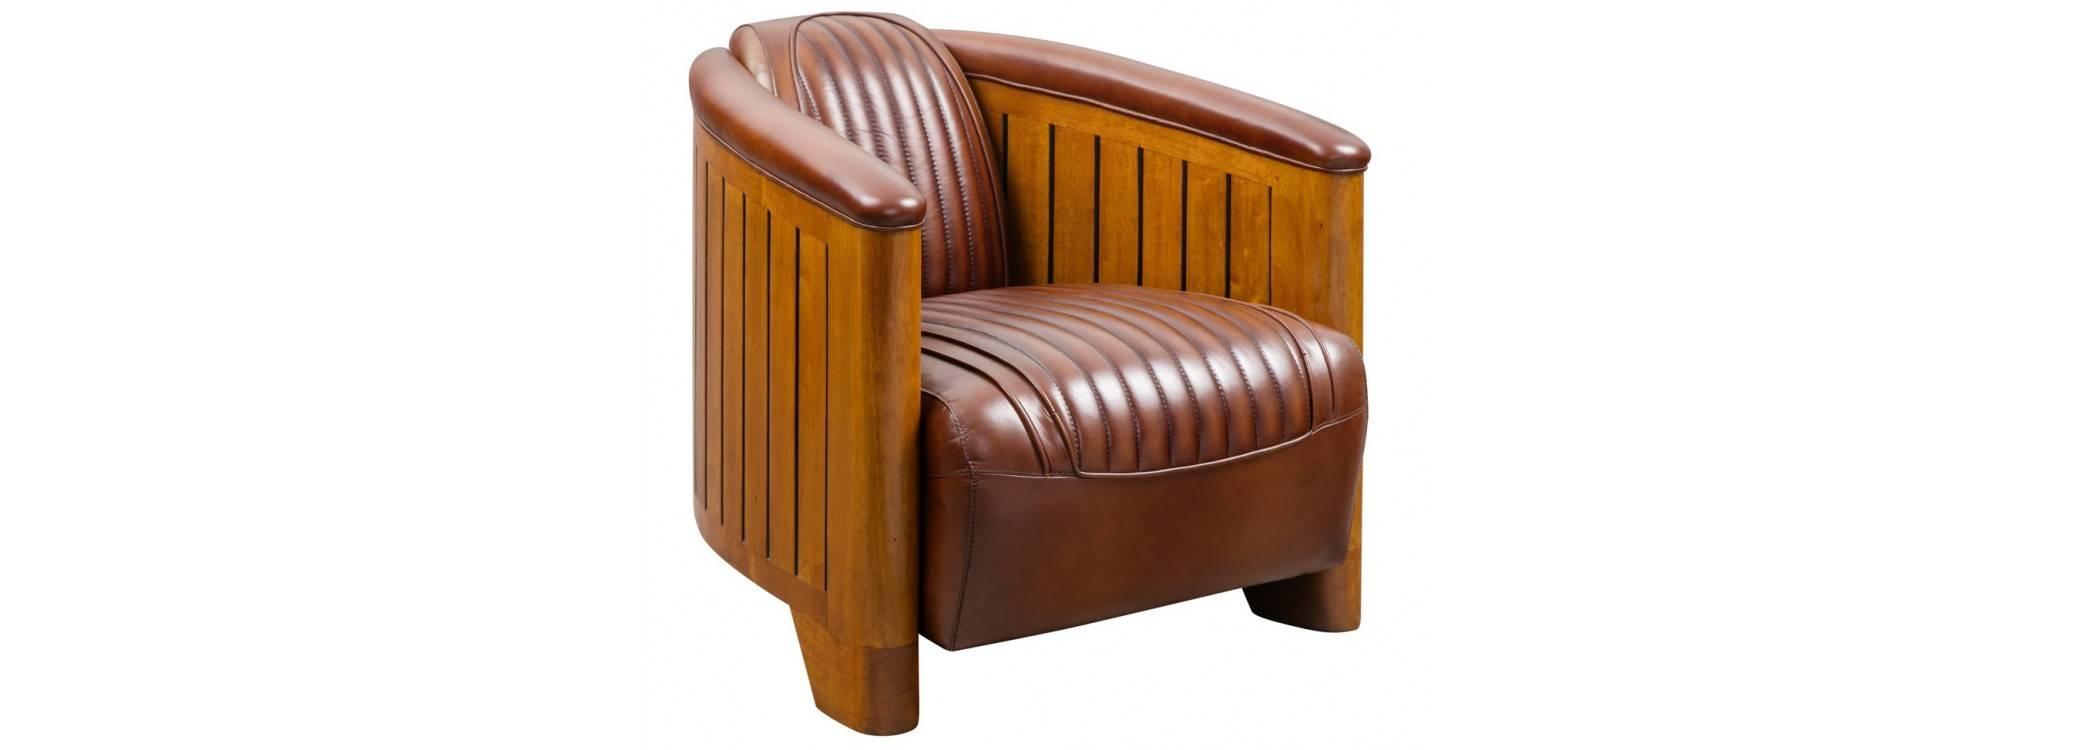 Canoë armchair - Brown leather